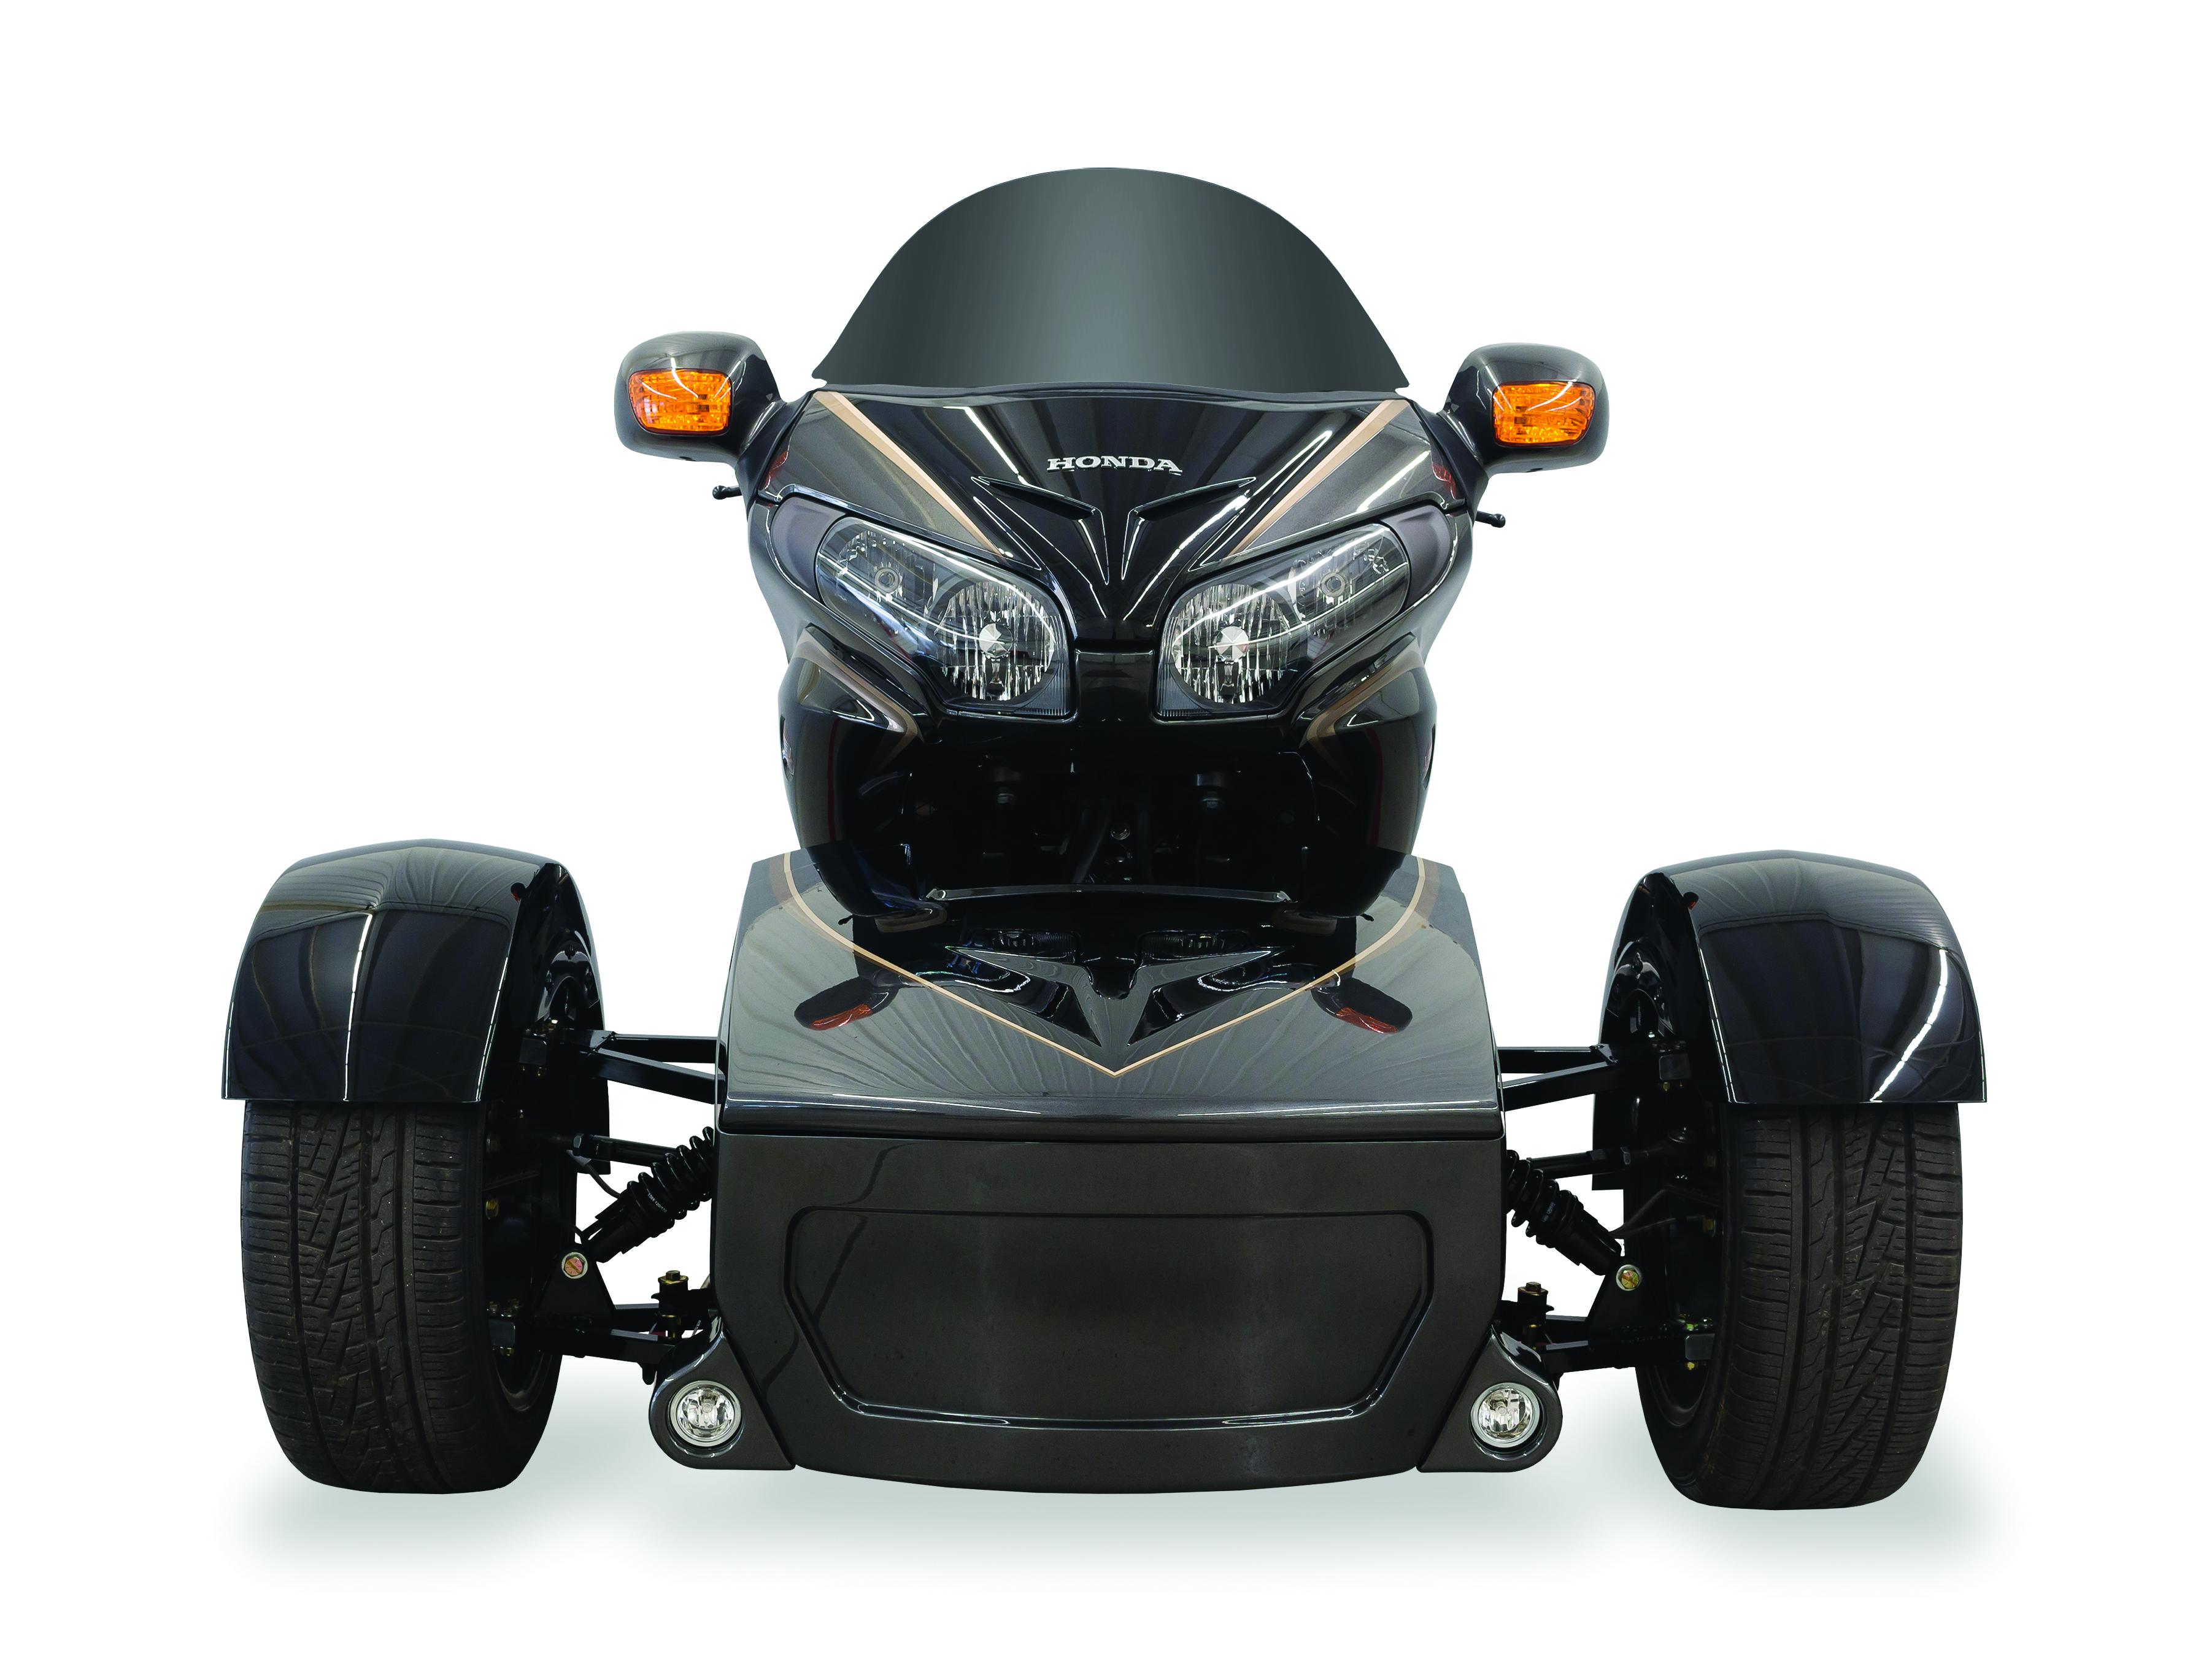 Wiring Diagram Honda Trikes Electrical Diagrams 2002 Goldwing Schematic Trike Rear Fuse Box U2022 Civic